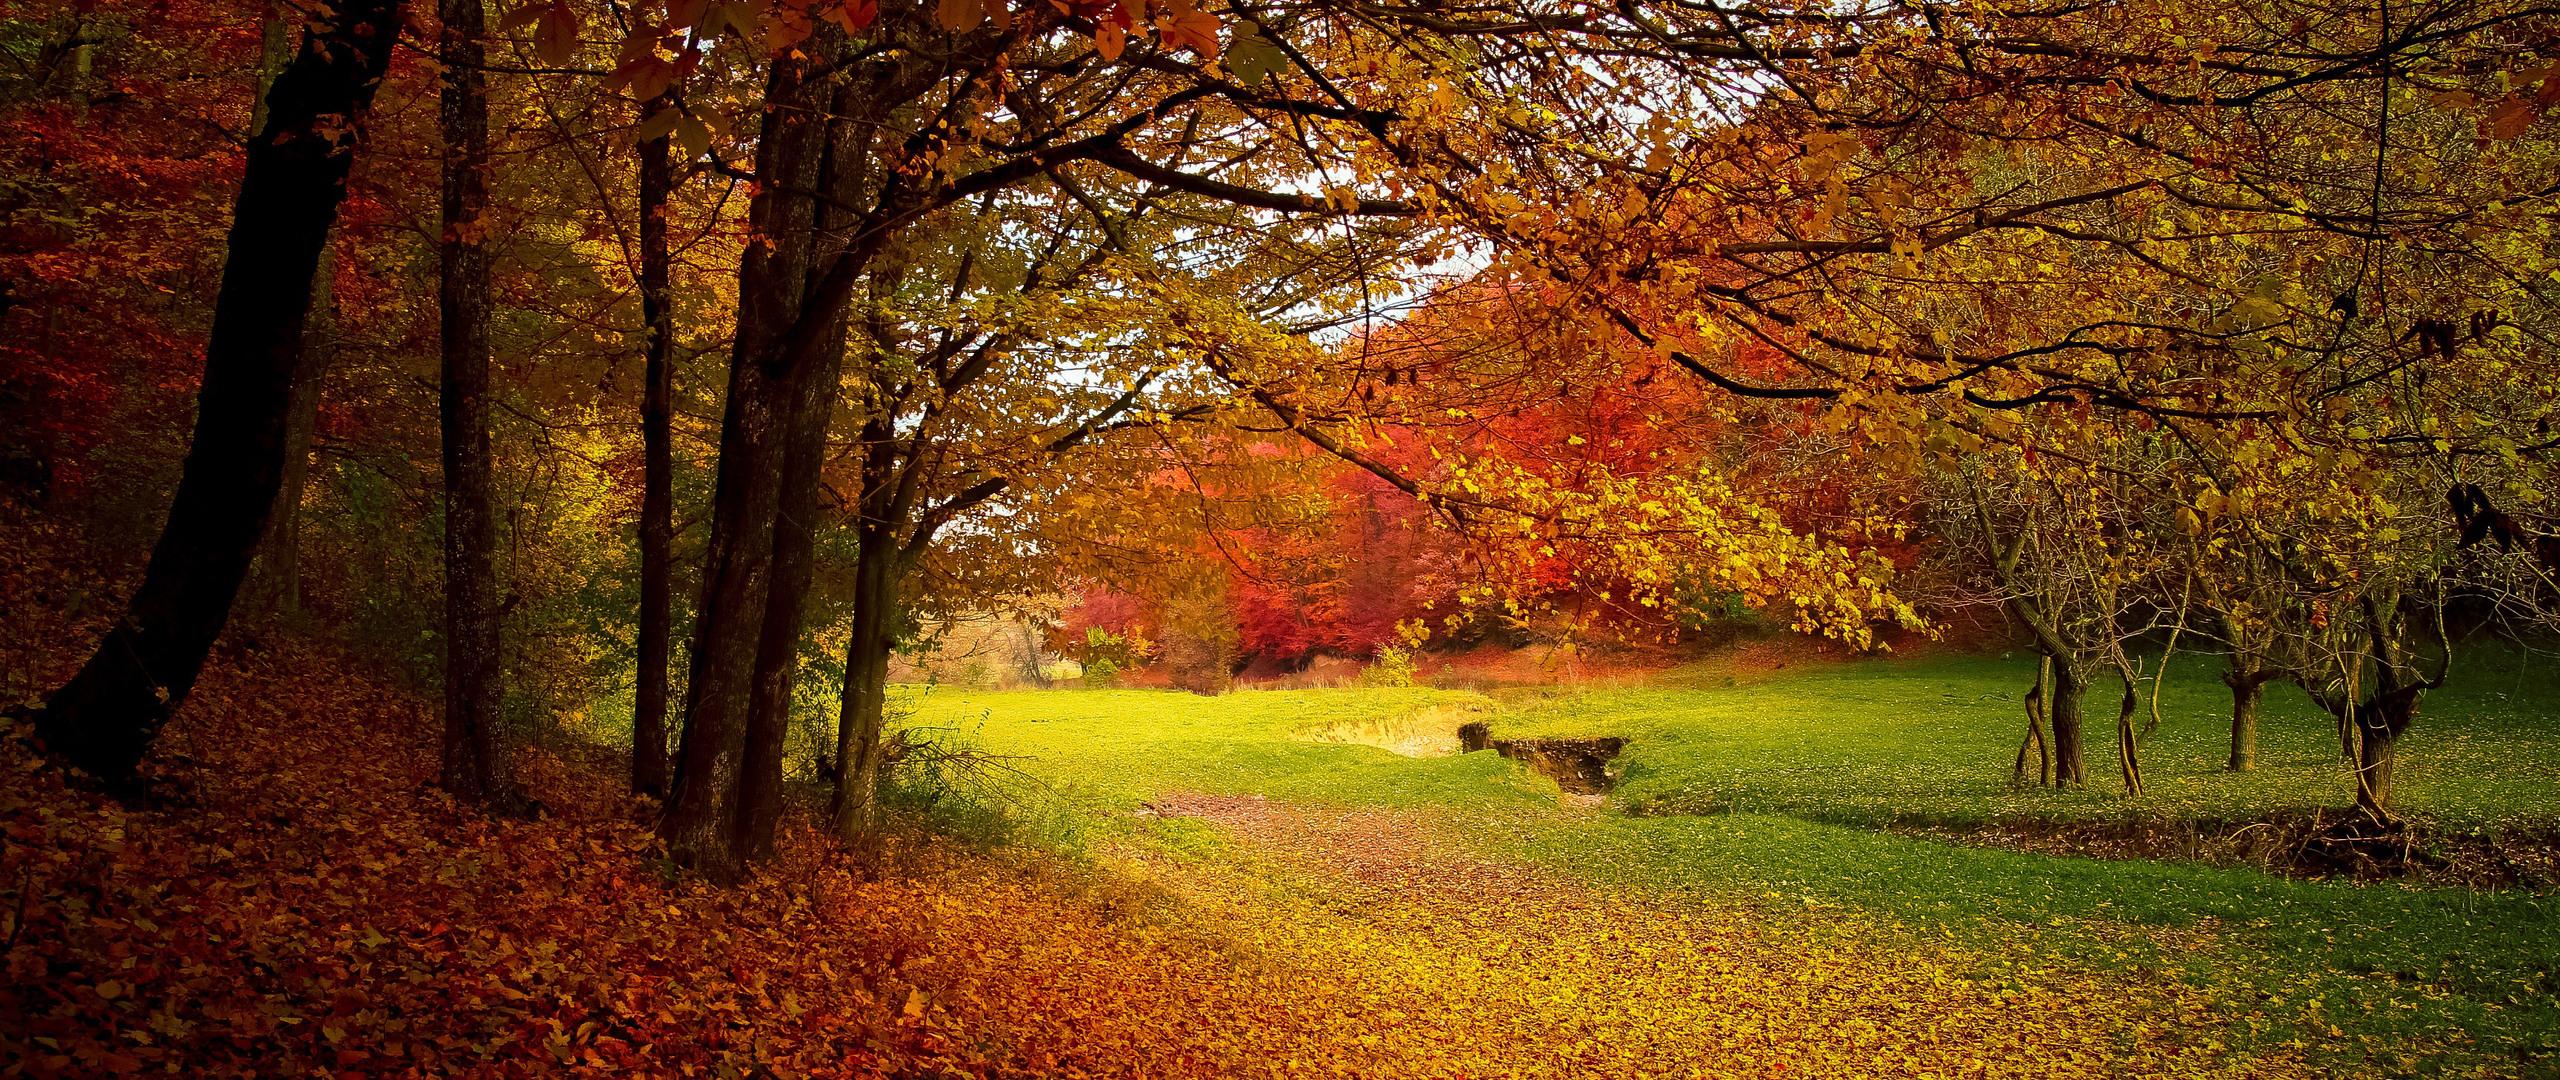 autumn-trees-fall-gj.jpg